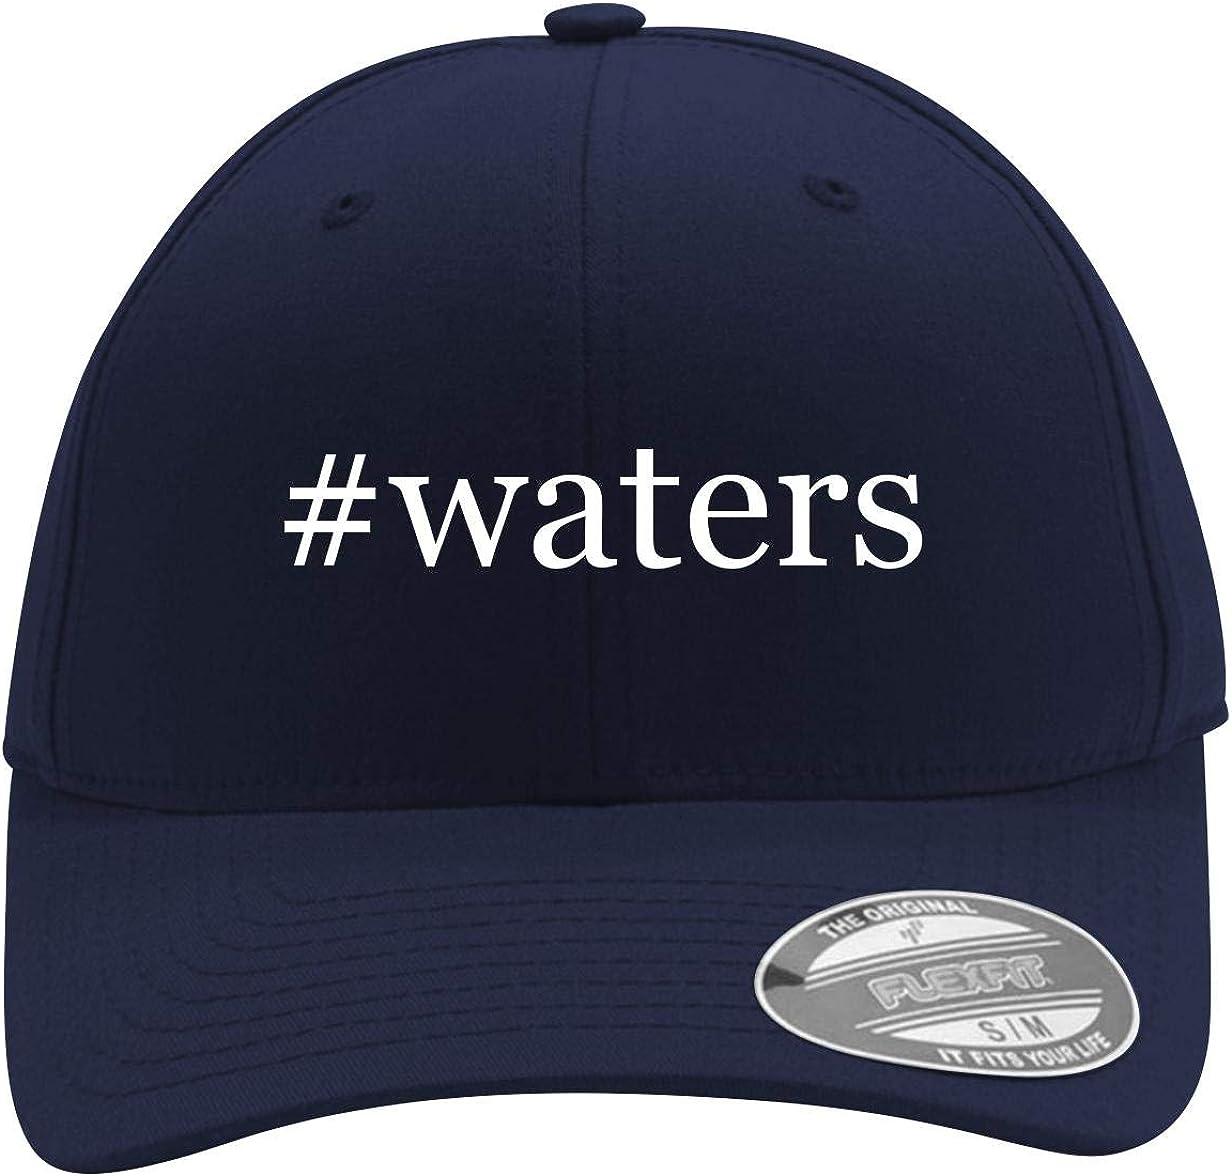 #Waters - Men's Hashtag Flexfit Baseball Cap Hat